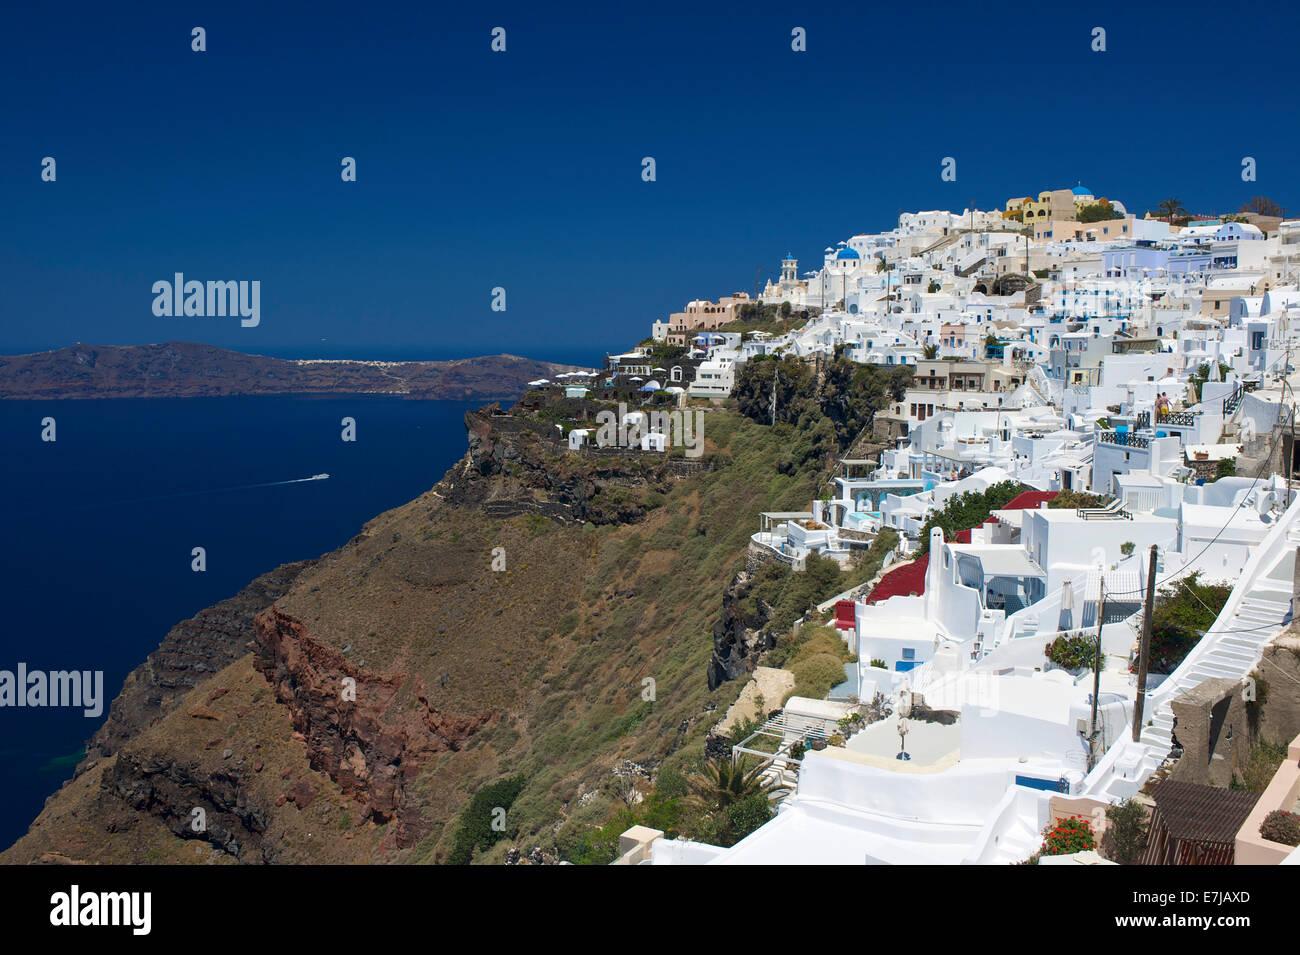 Vista de Imerovigli, Santorini, Cícladas, Grecia Imagen De Stock